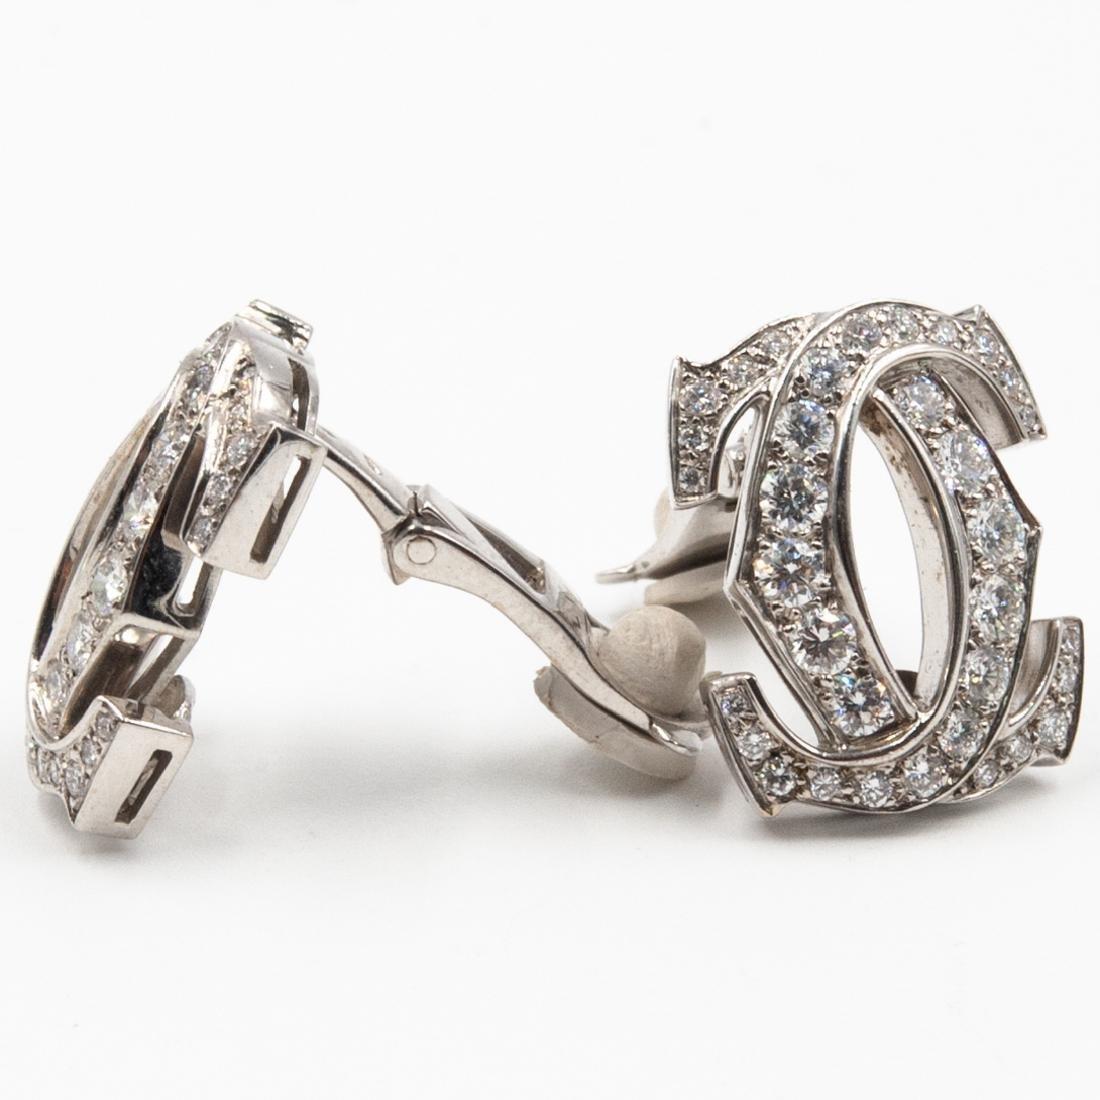 Pair of 18K Cartier C de Cartier Diamond Earrings - 2